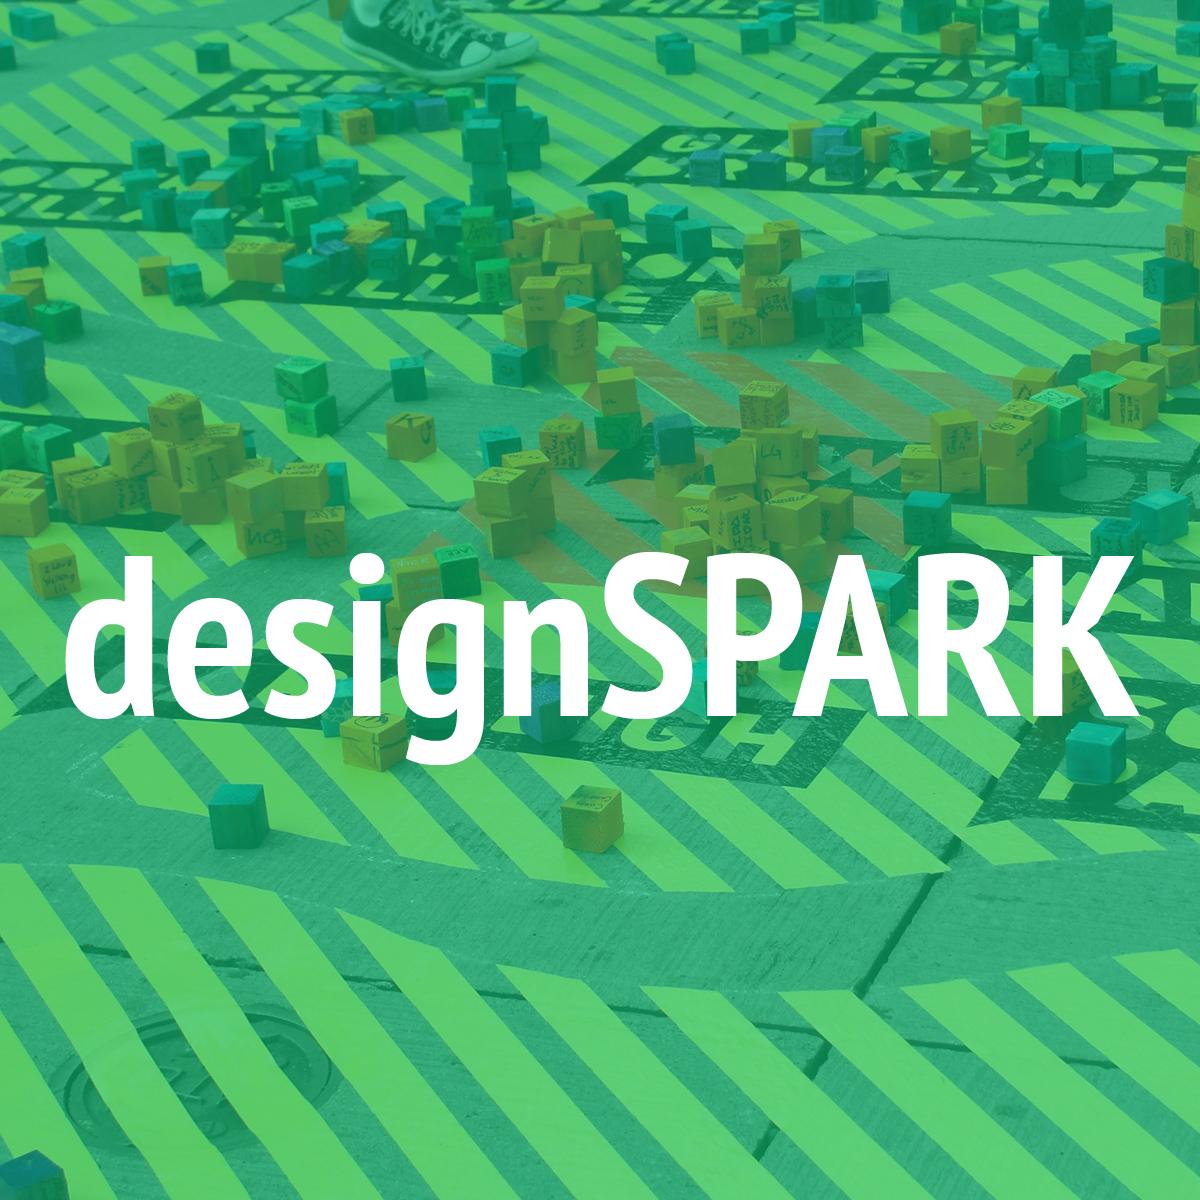 designspark.jpg